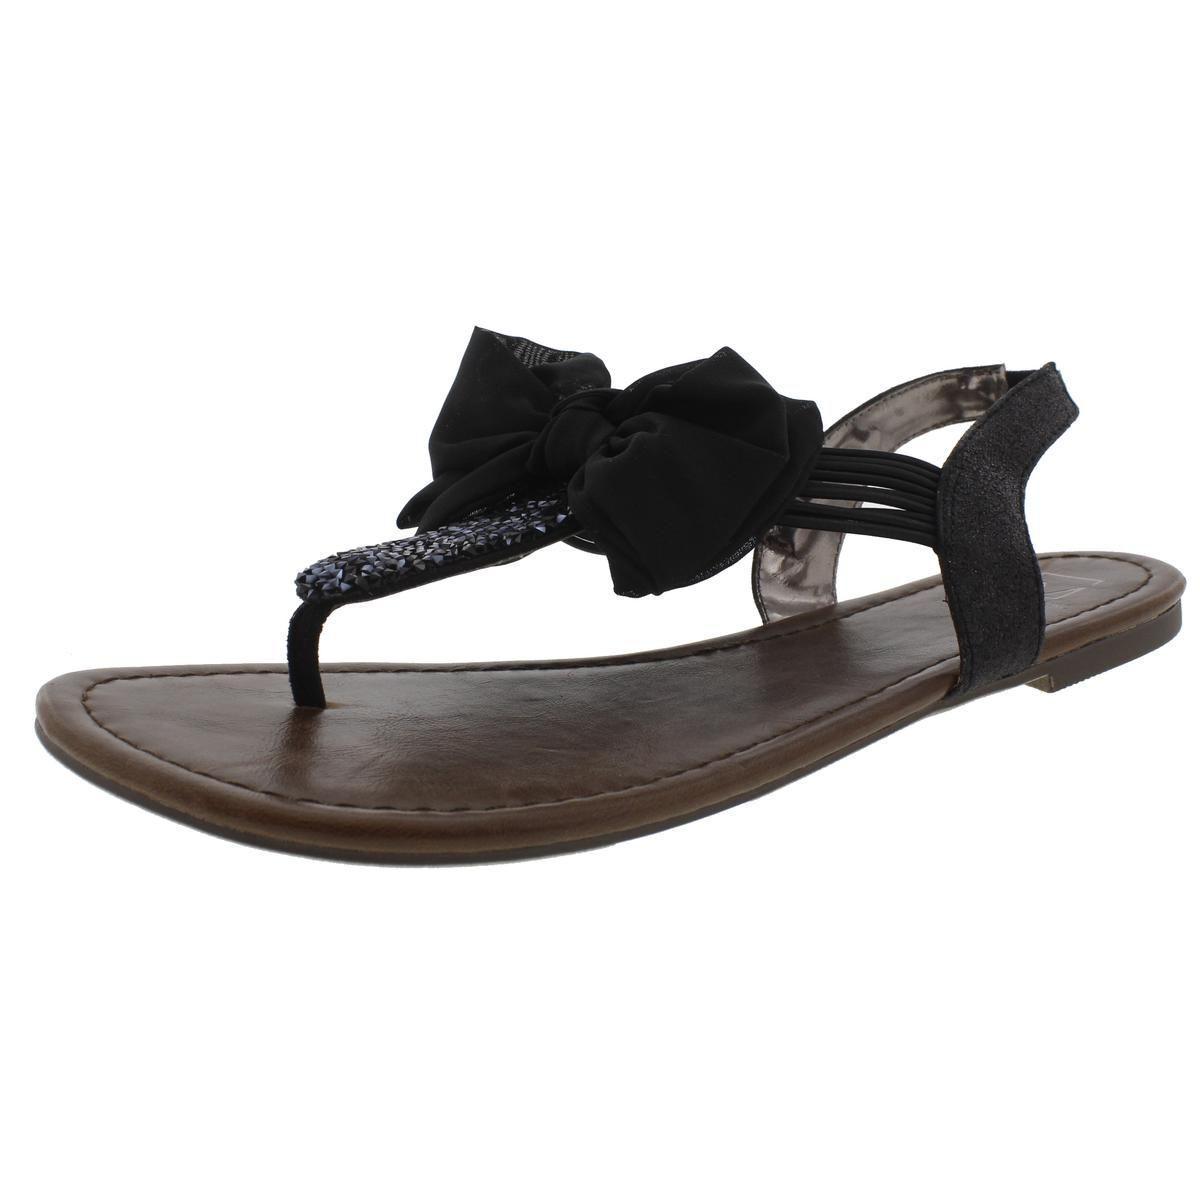 32a2fcbd5d43 Lyst - Material Girl Womens Swan Glitter Bow Thong Sandals in Black